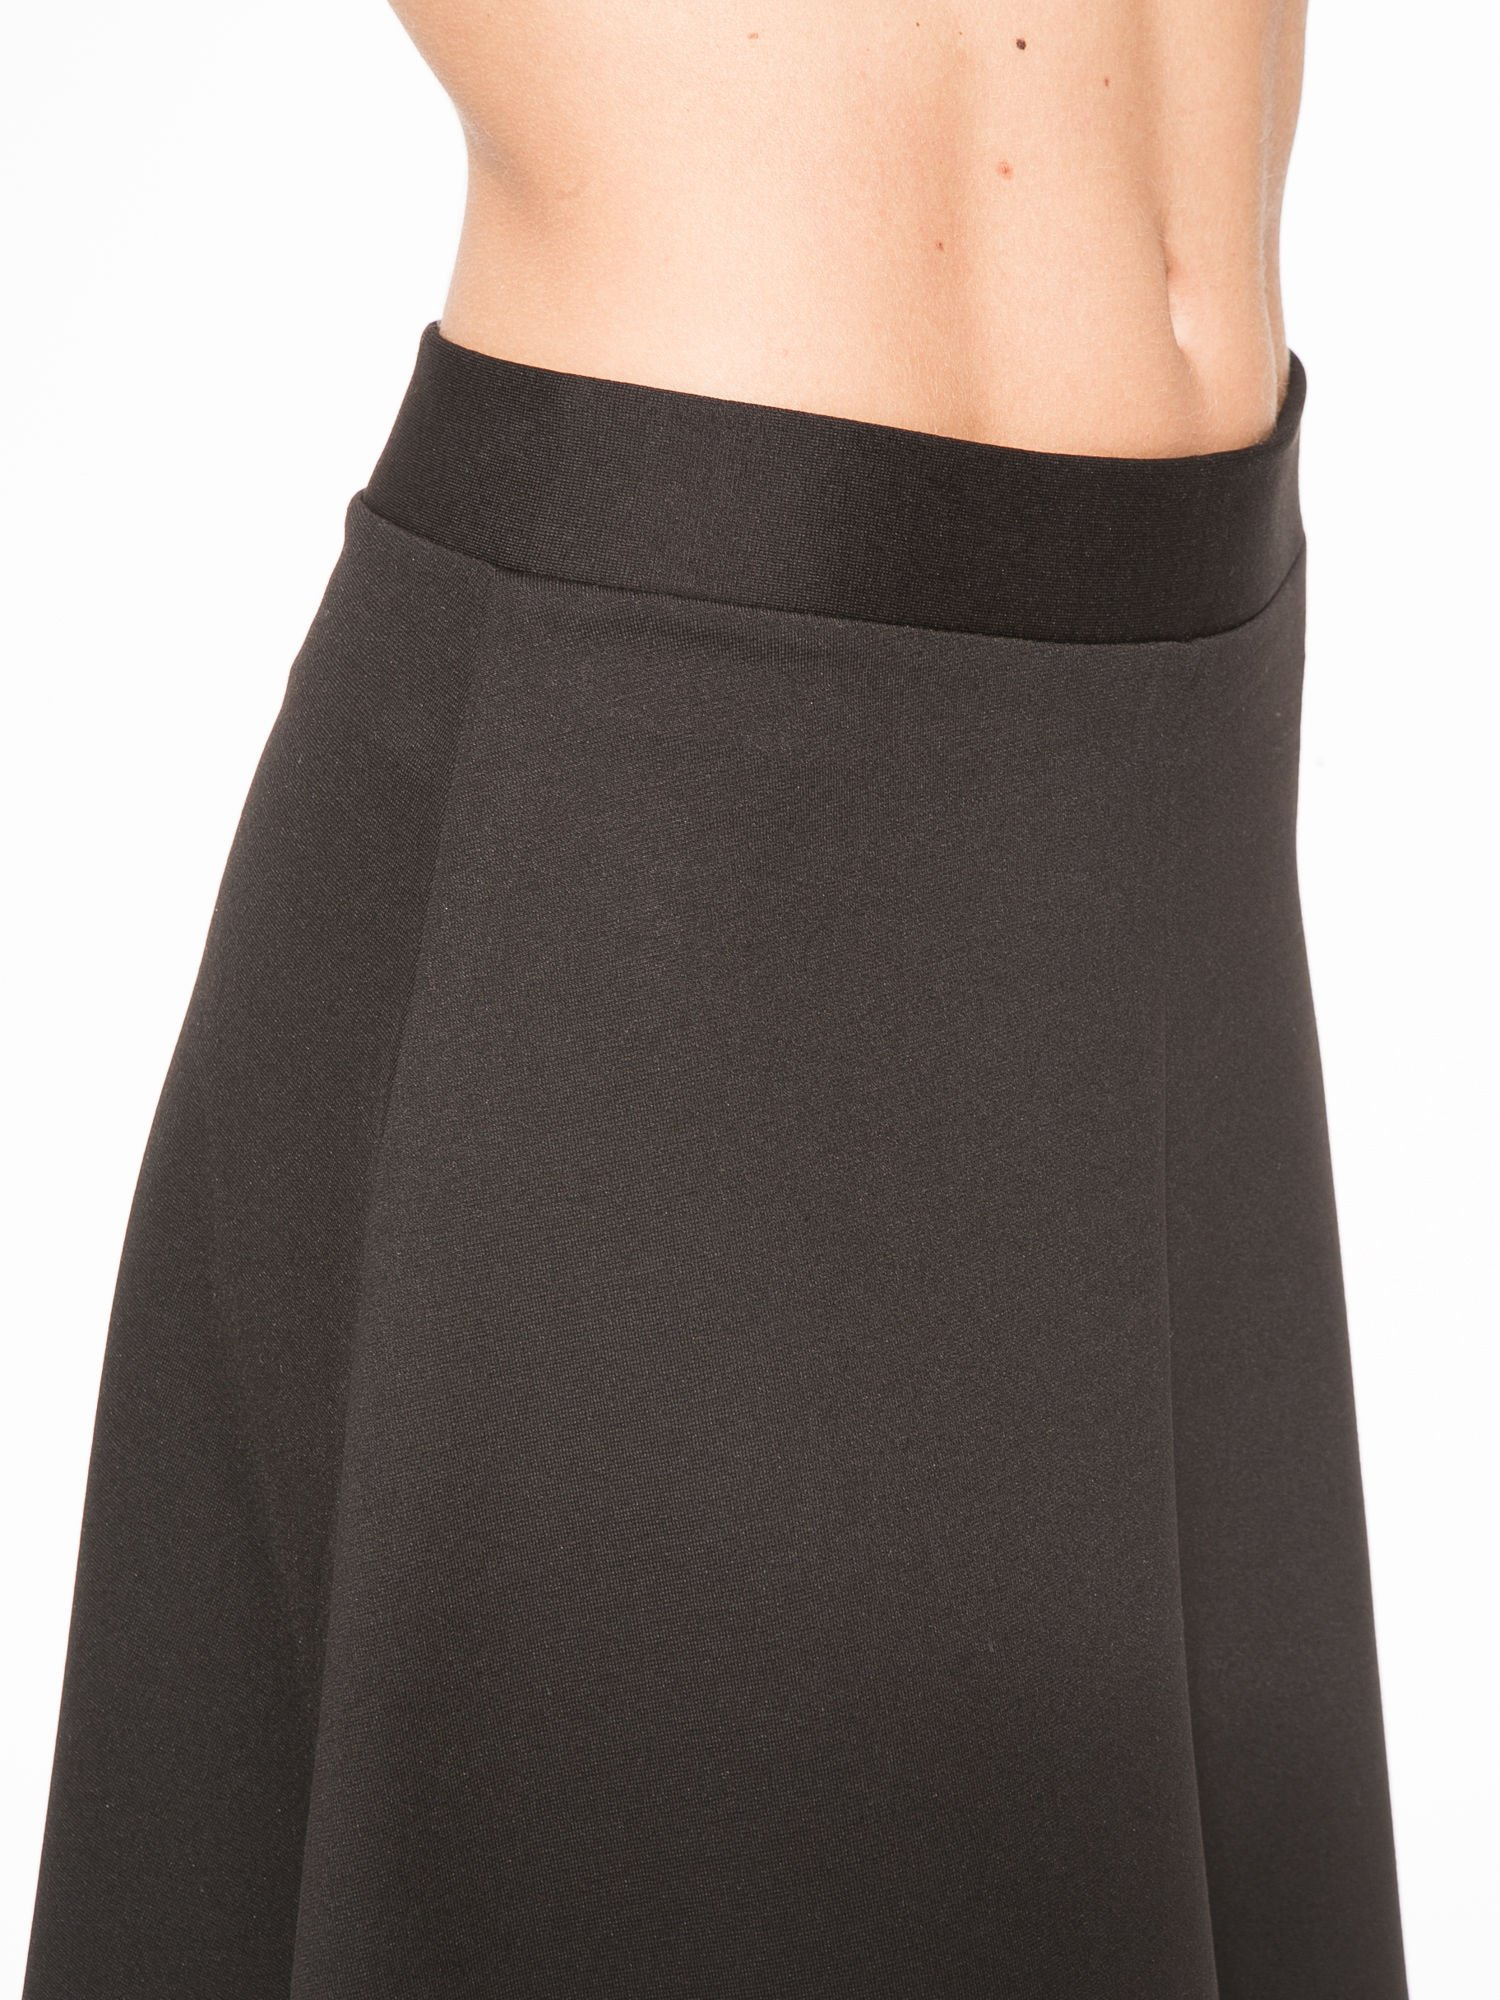 Czarna spódnica midi w kształcie litery A                                  zdj.                                  7